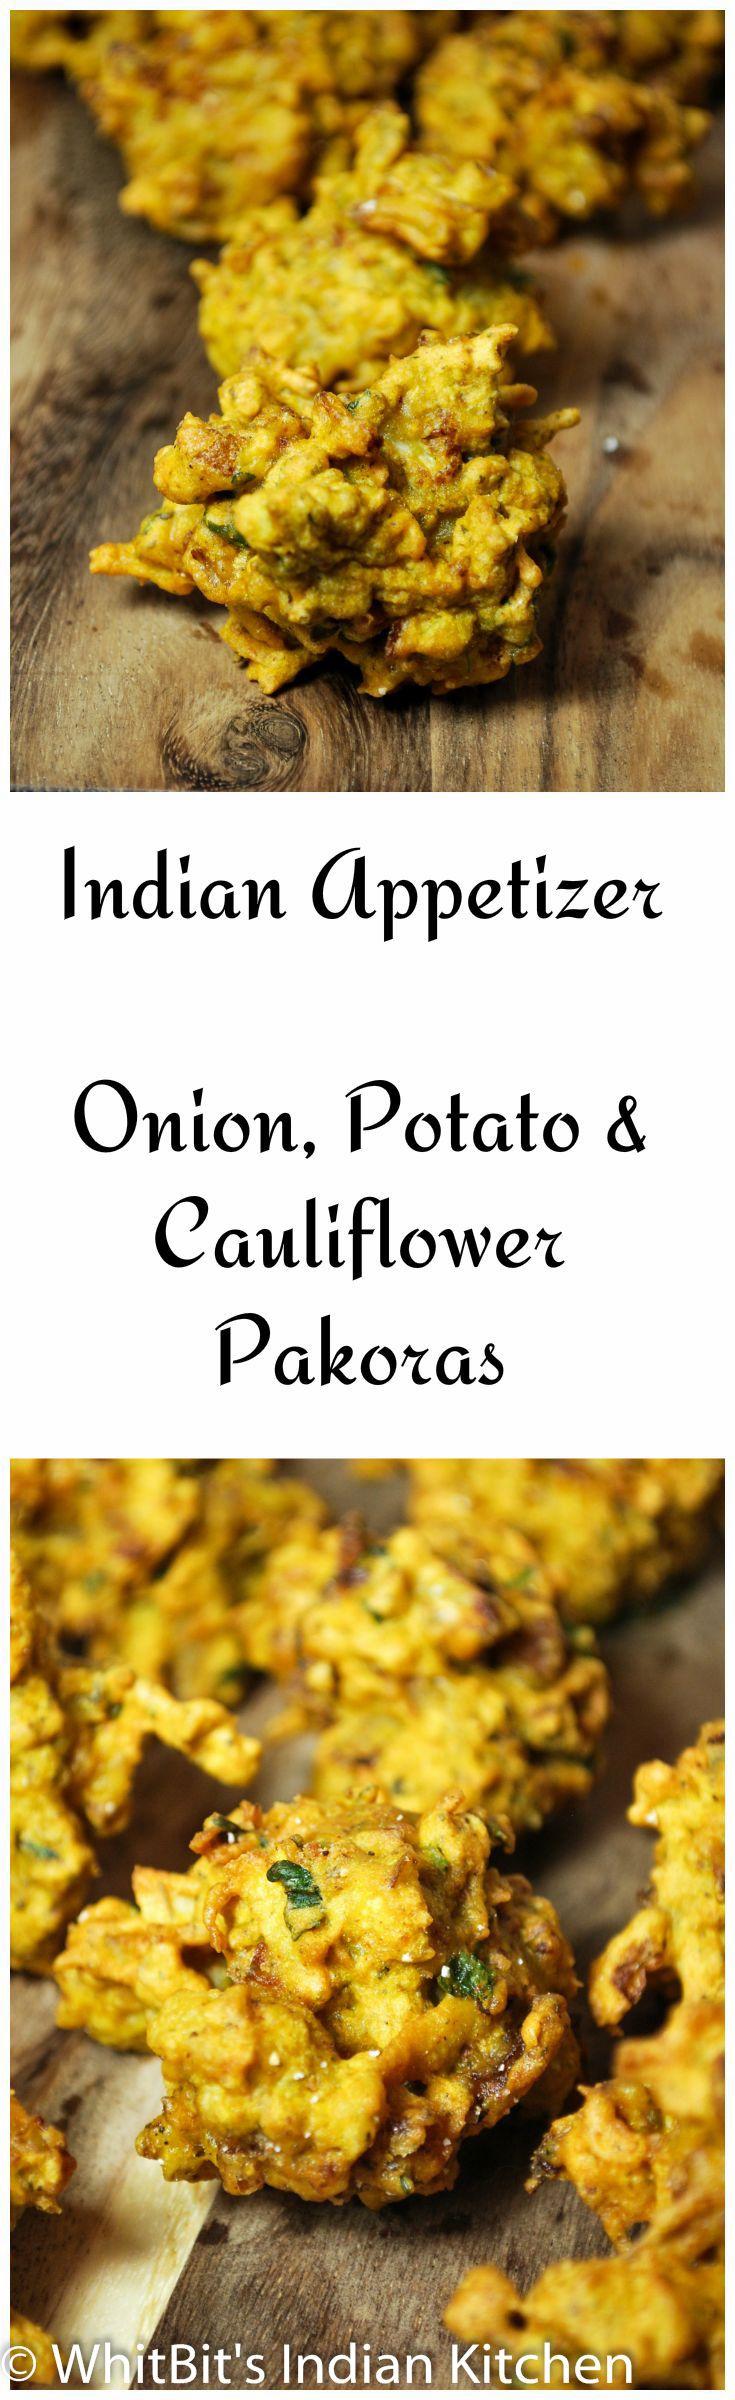 Vegetarian Indian Appetizers